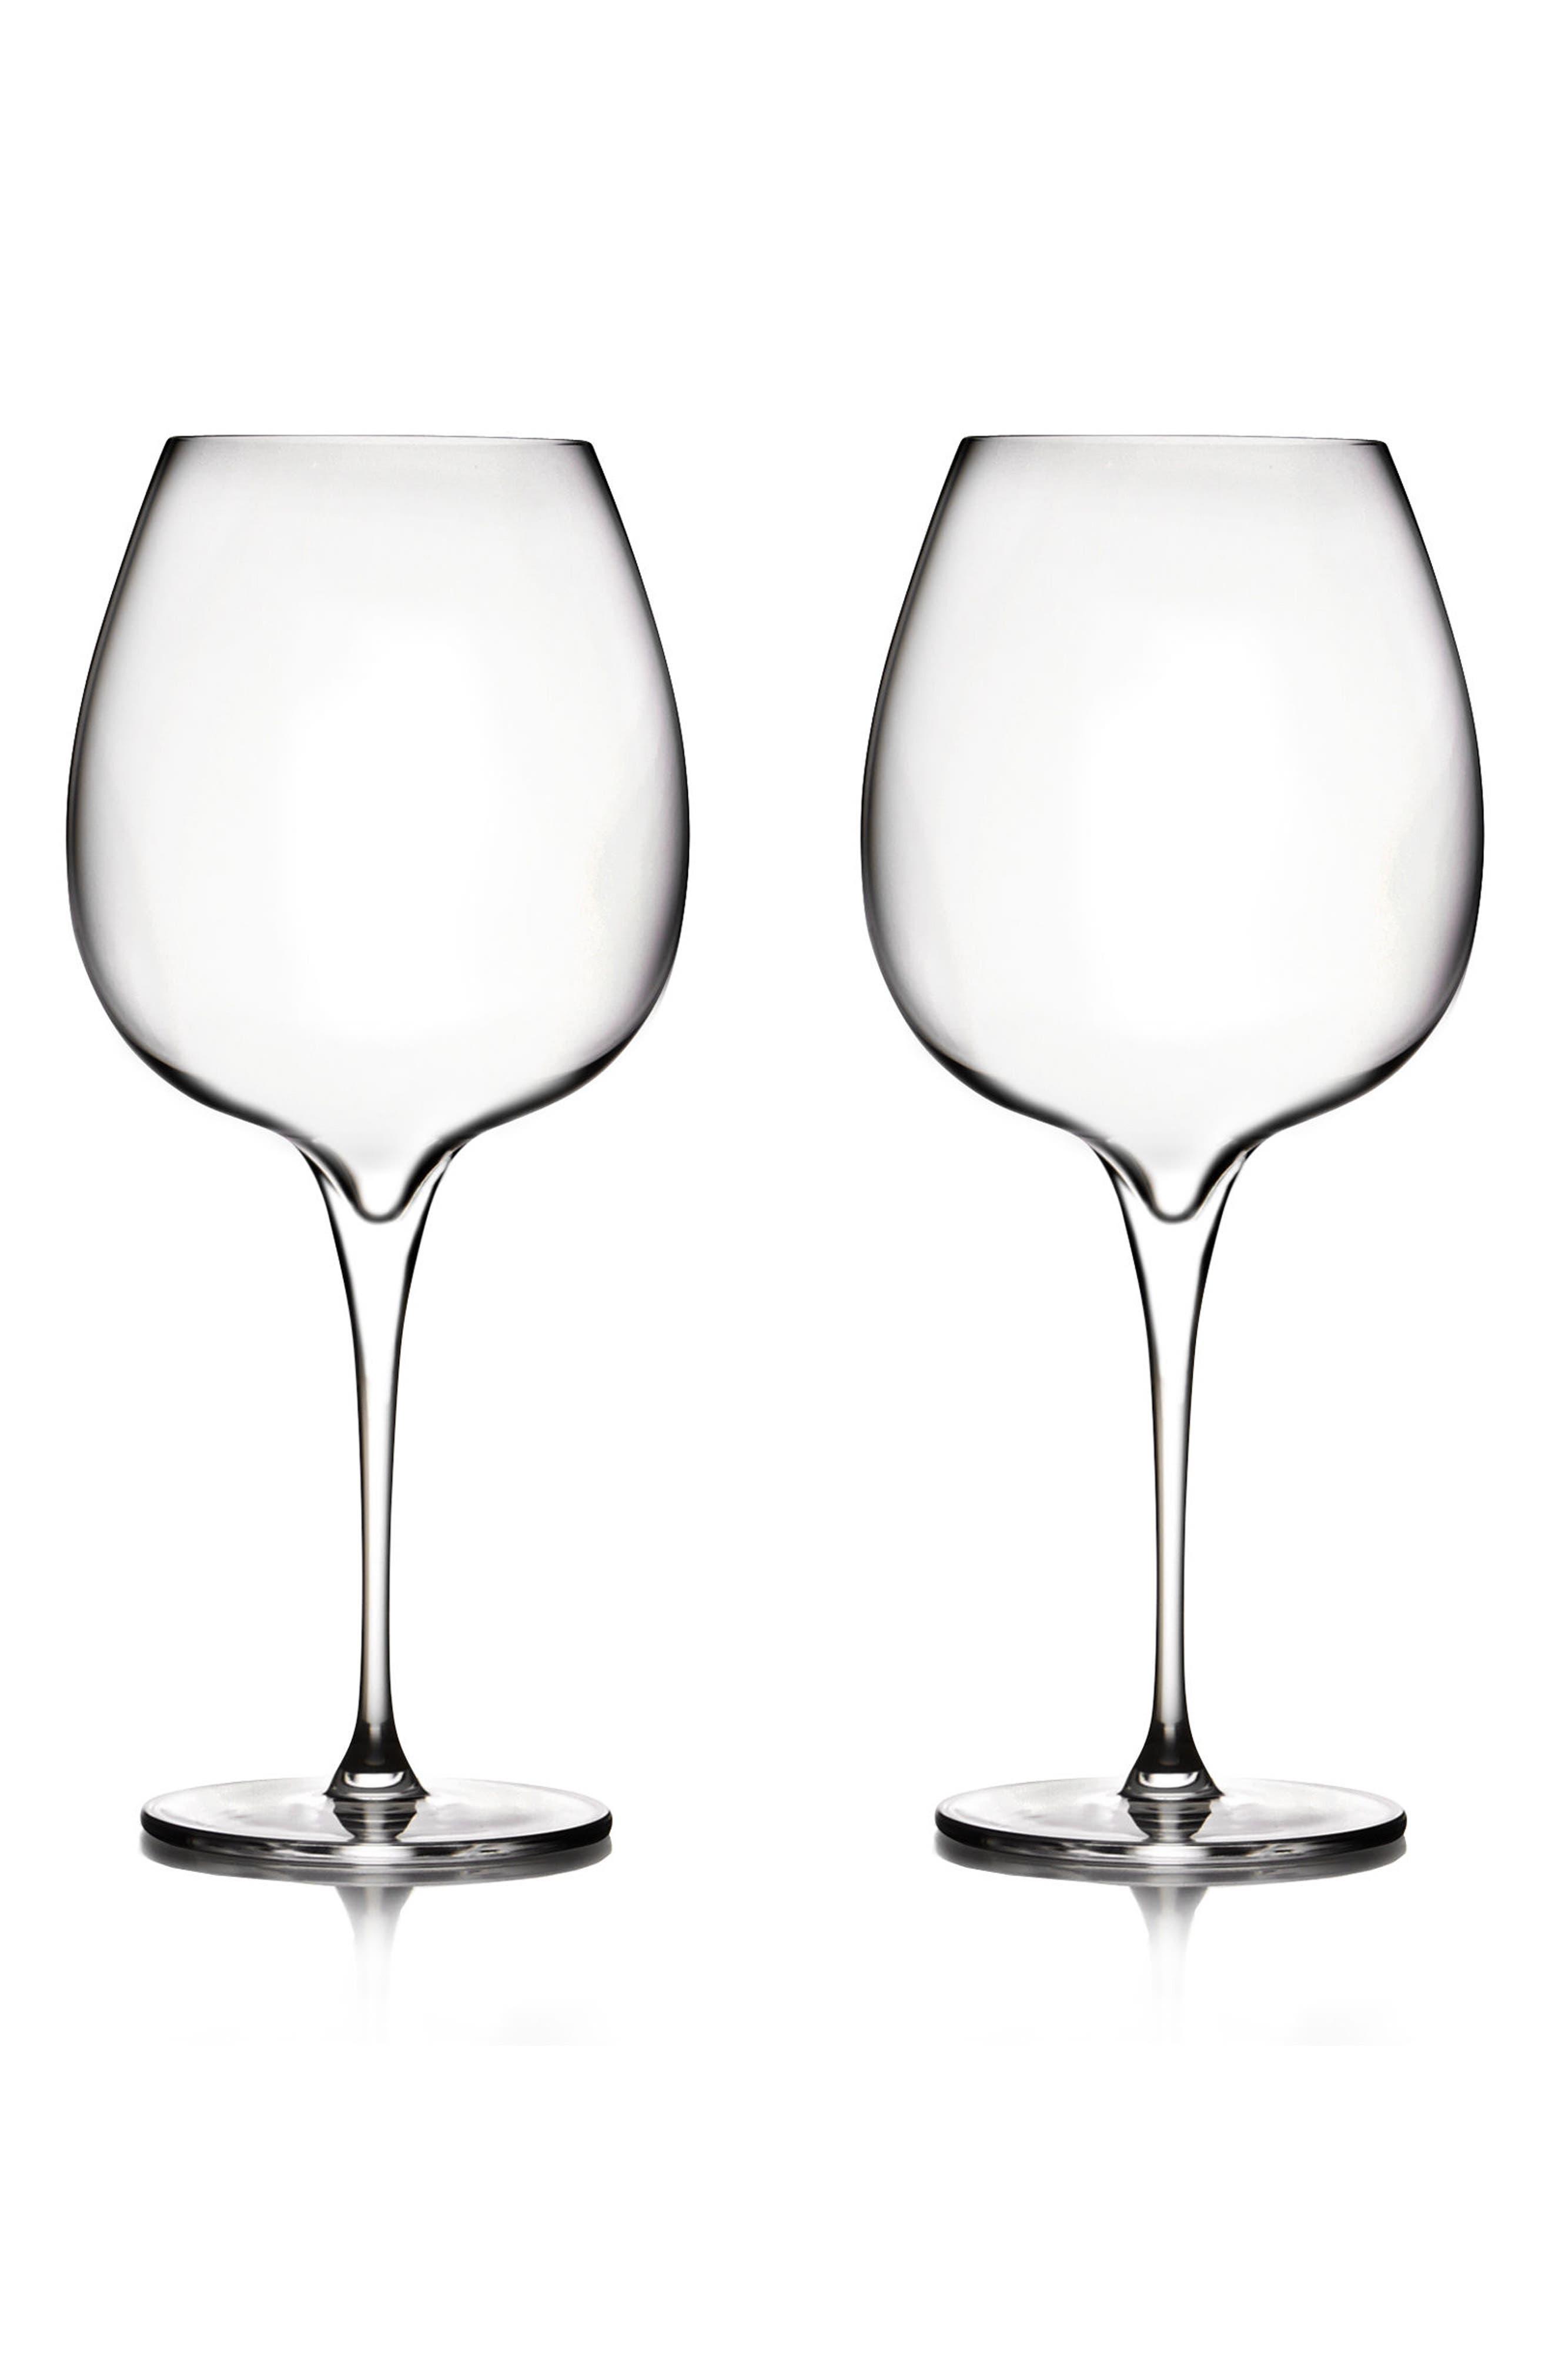 Vie Set of 2 Pinot Noir Glasses,                             Main thumbnail 1, color,                             100